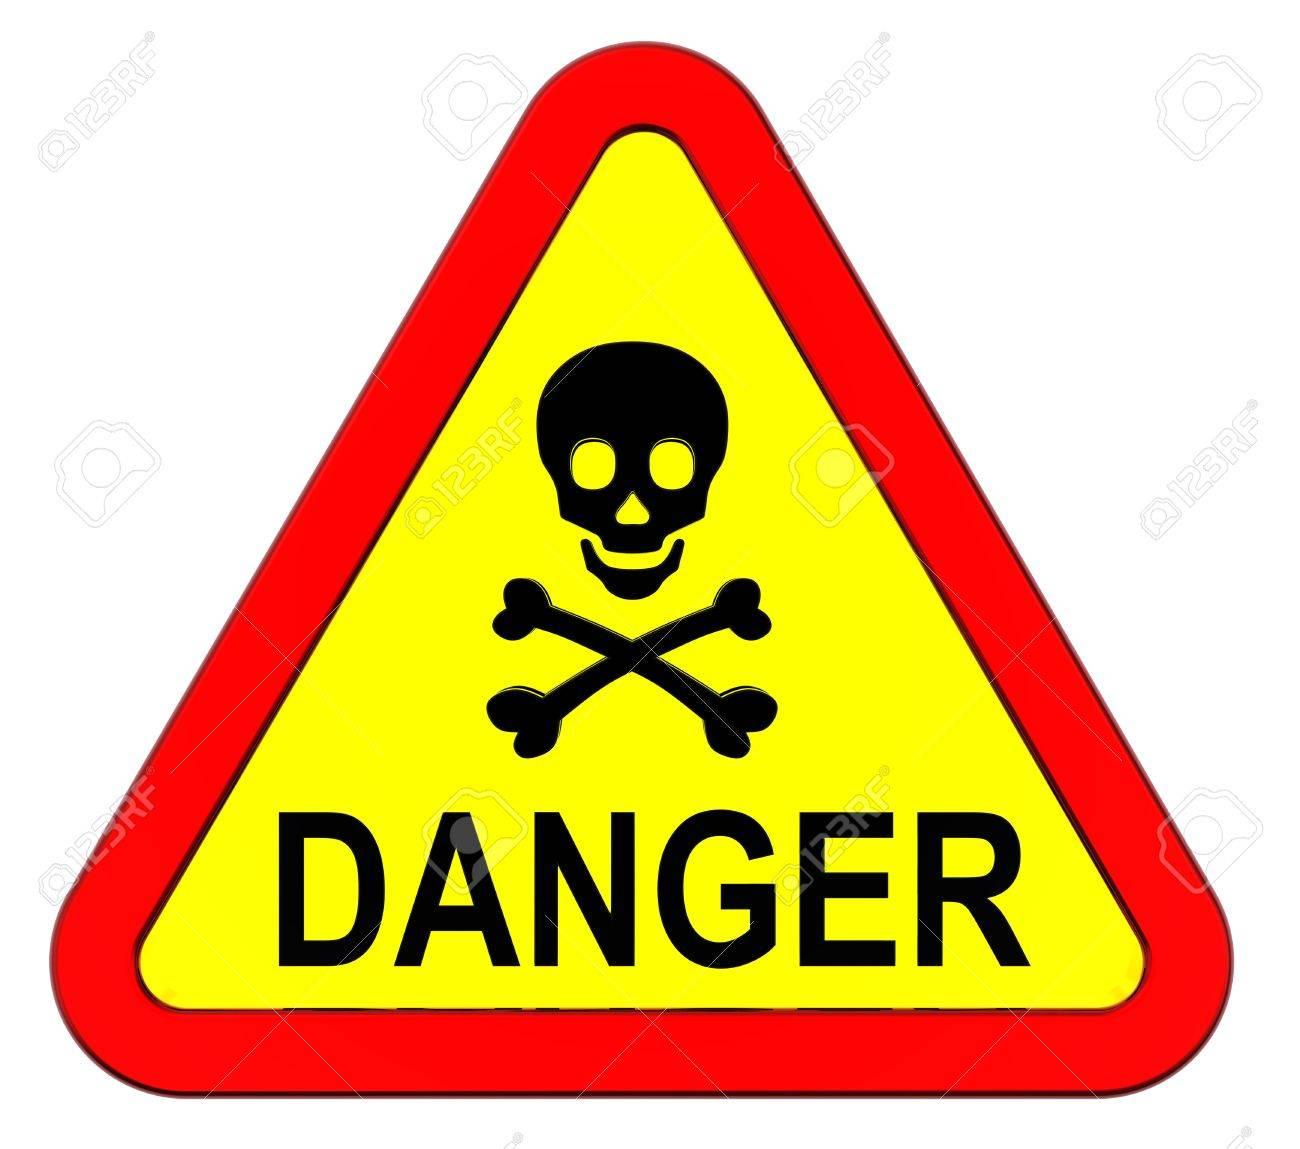 Danger warning sign isolated on white Stock Photo - 9700502